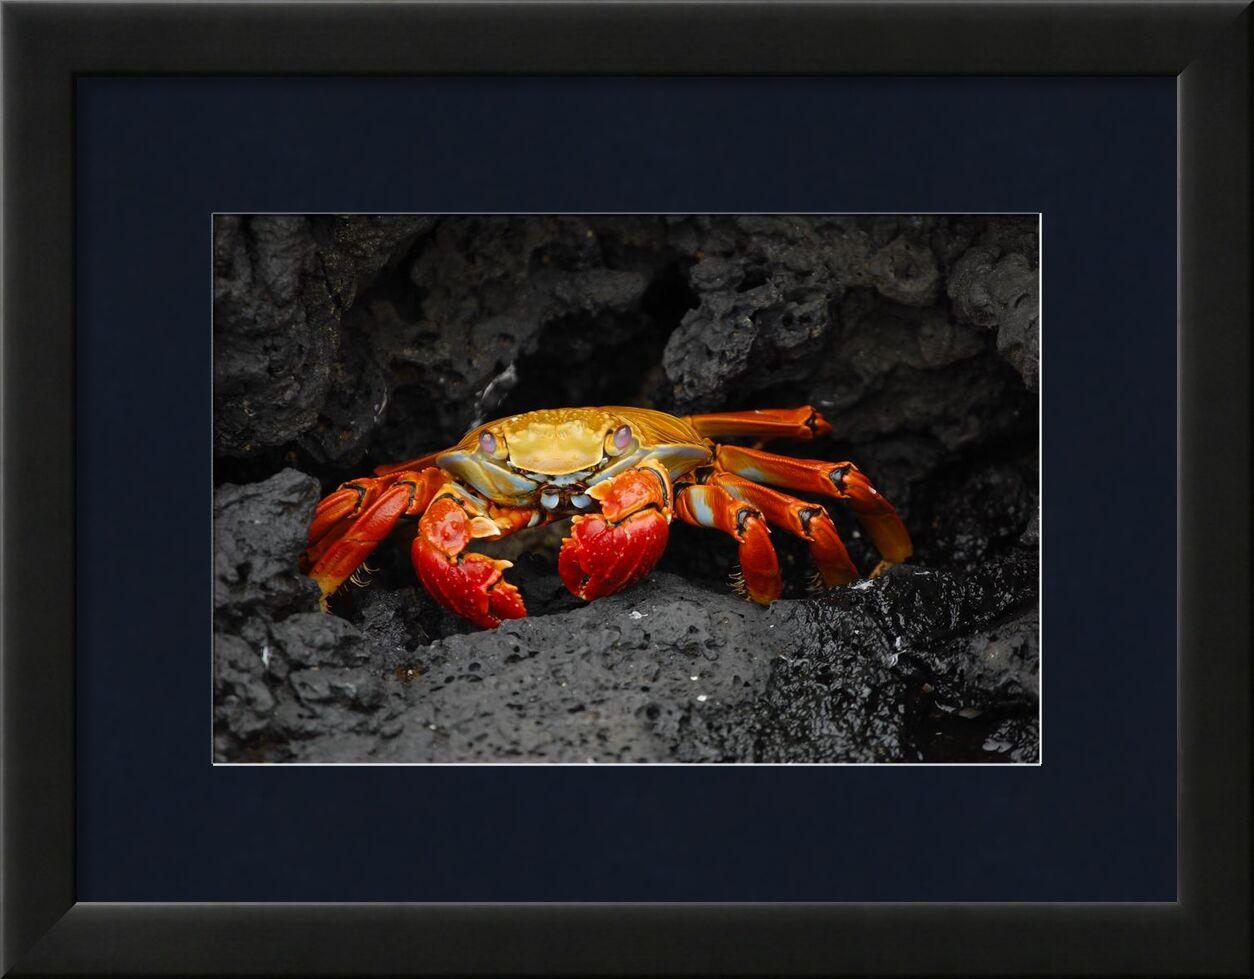 Crabe from Aliss ART, Prodi Art, animal, creature, rocks, crab, crustacean, grapsus grapsus, red rock crab, shellfish